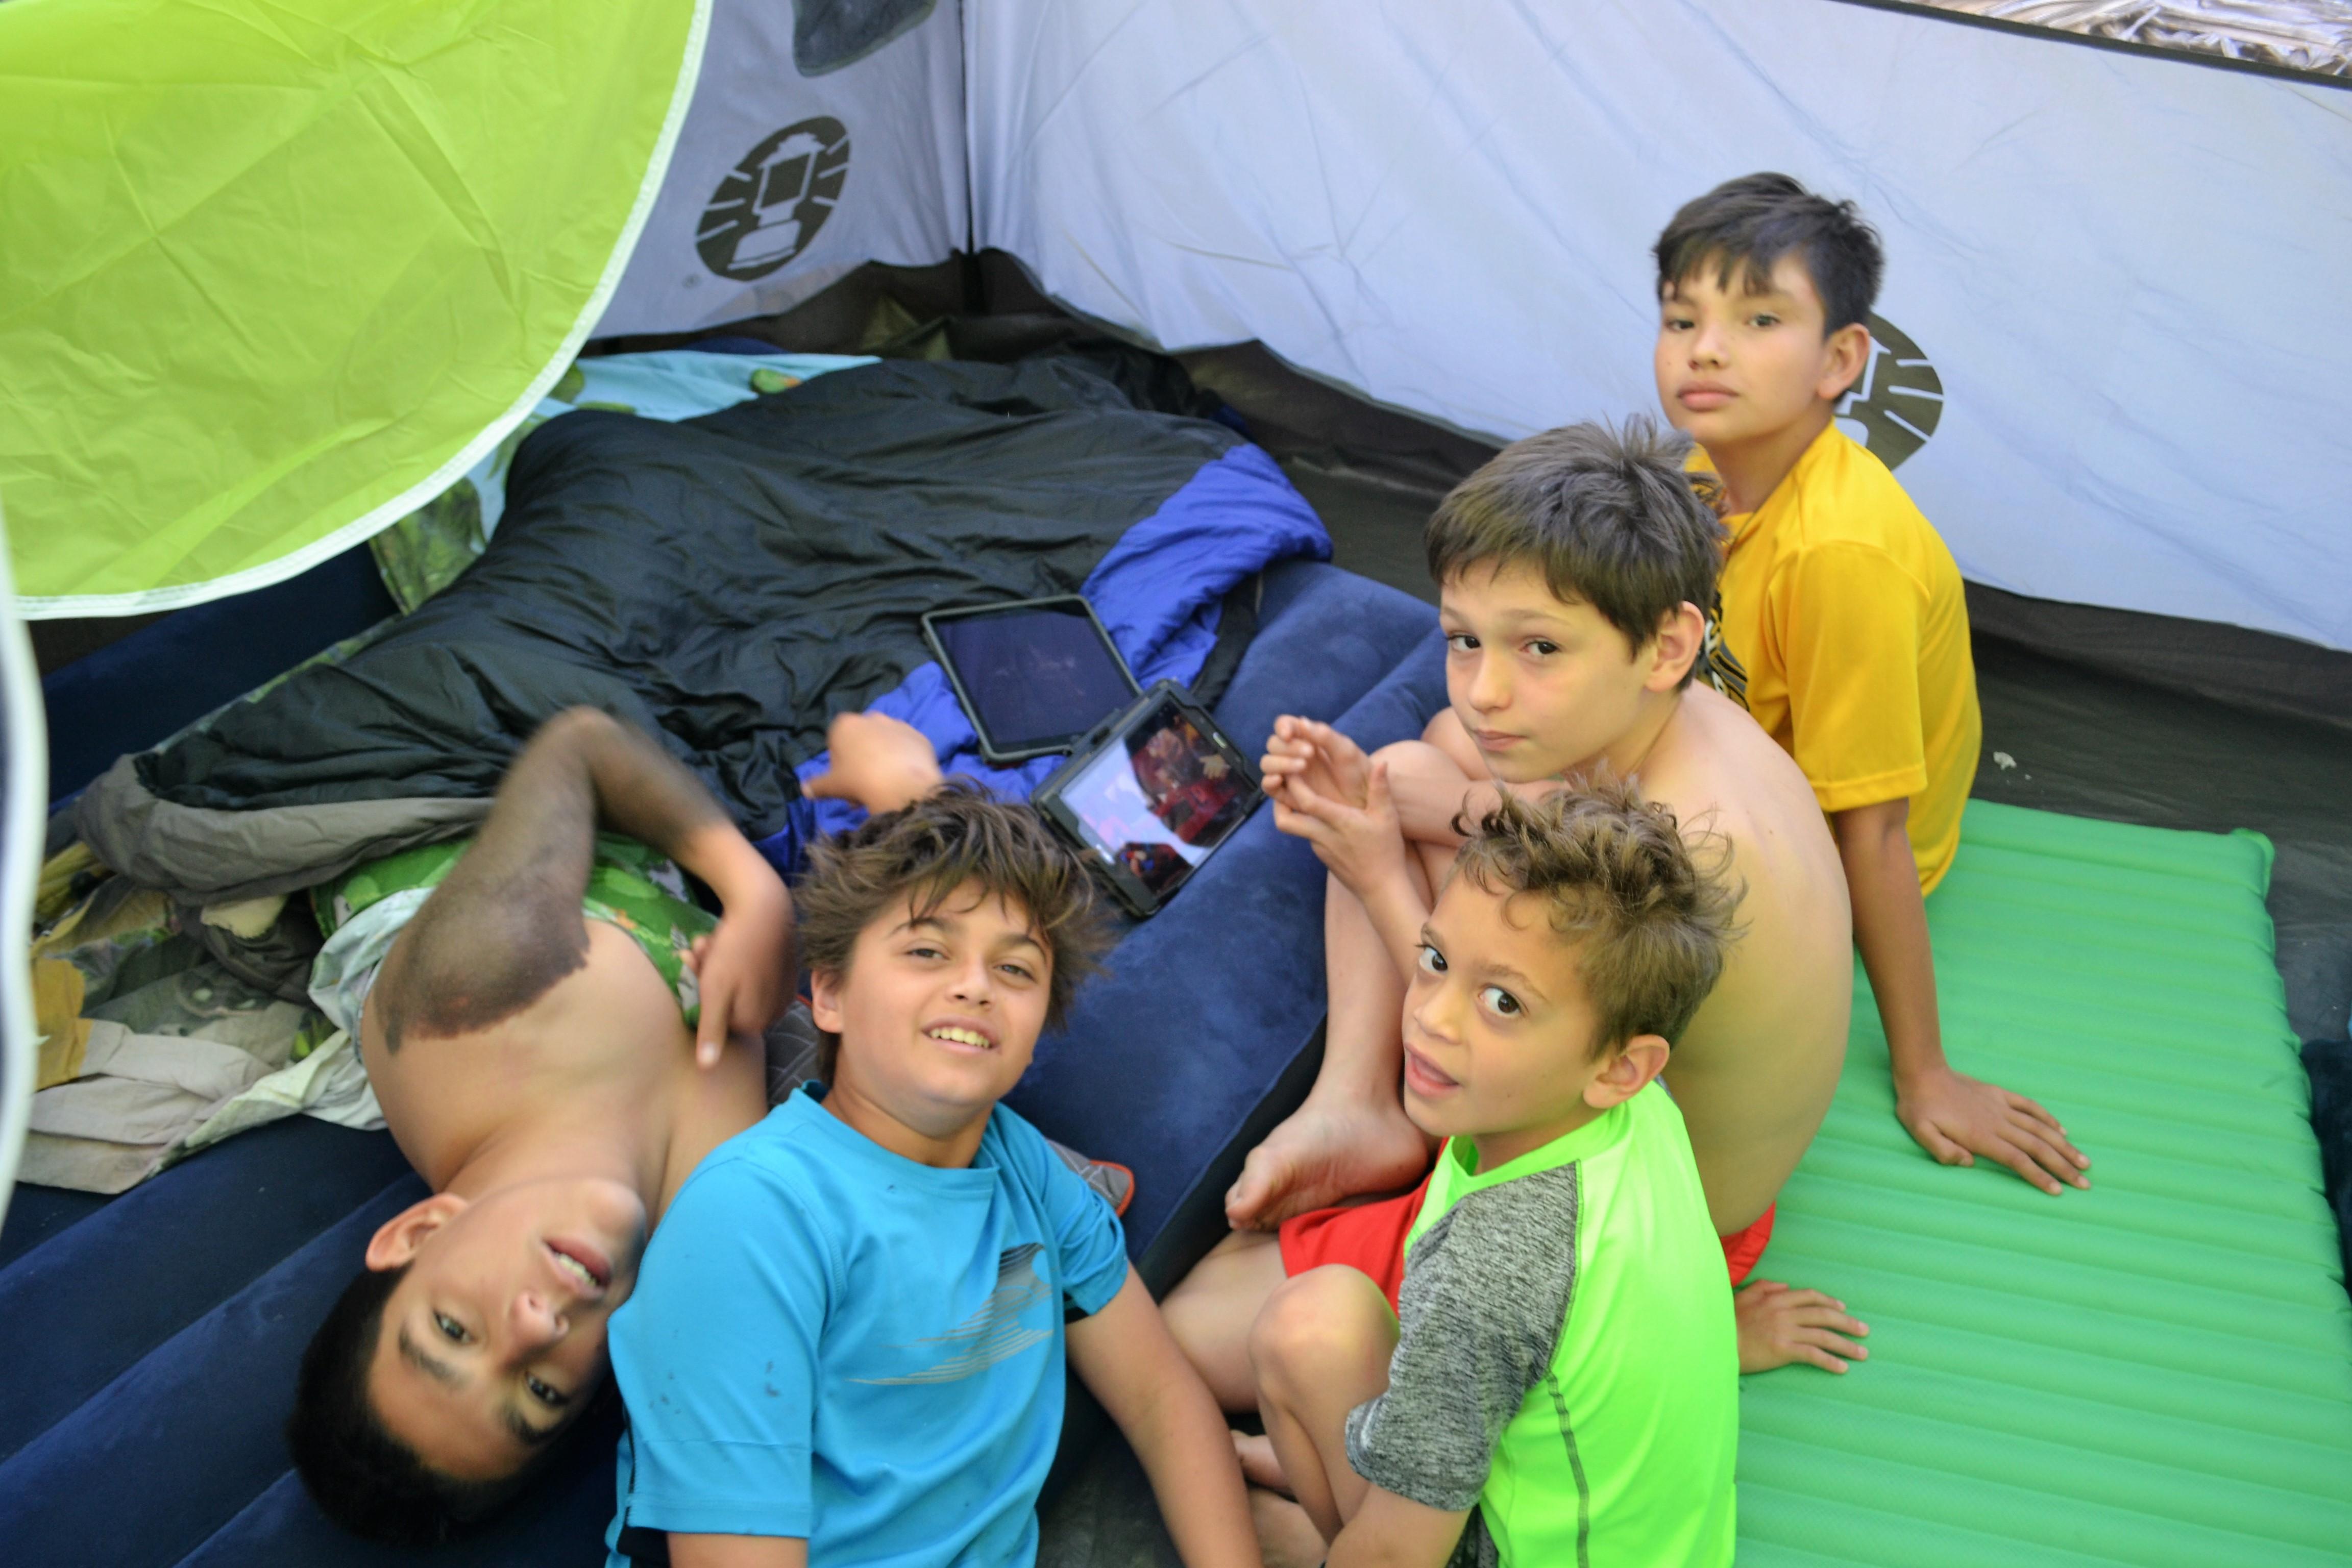 camping birthday party at the beach - guatemala